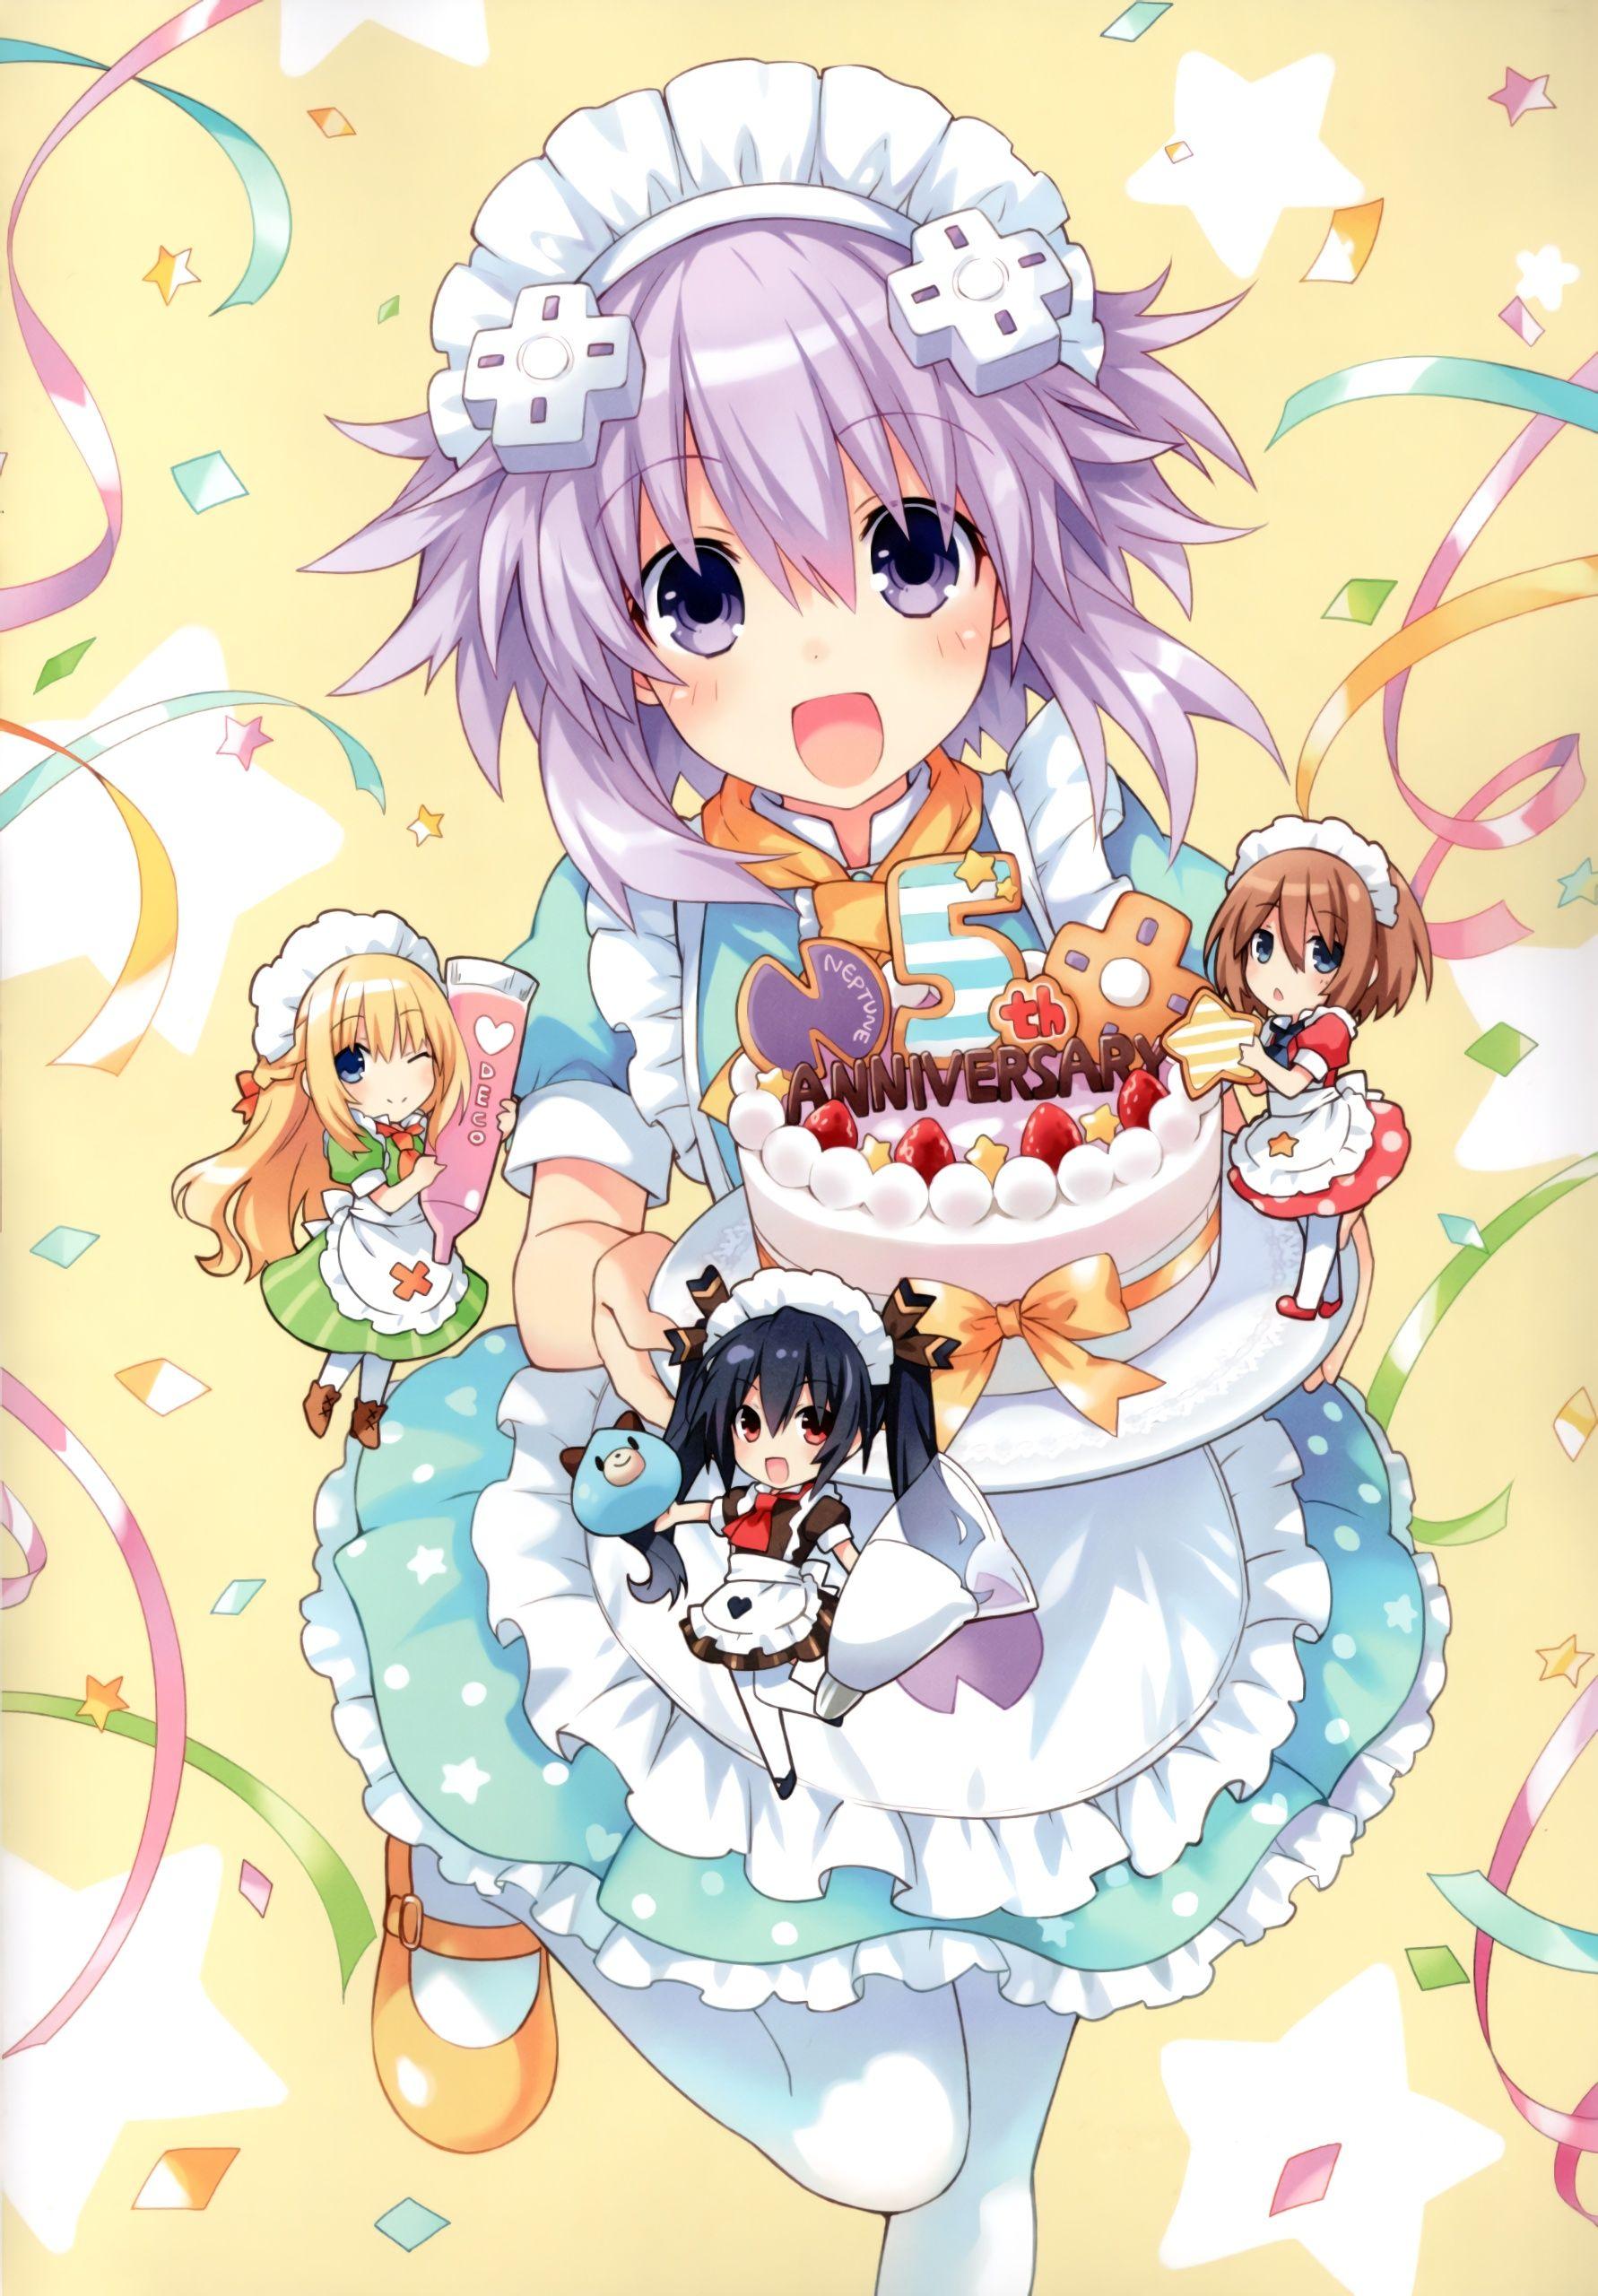 Hyperdimension Neptunia 5th anniversary poster Anime